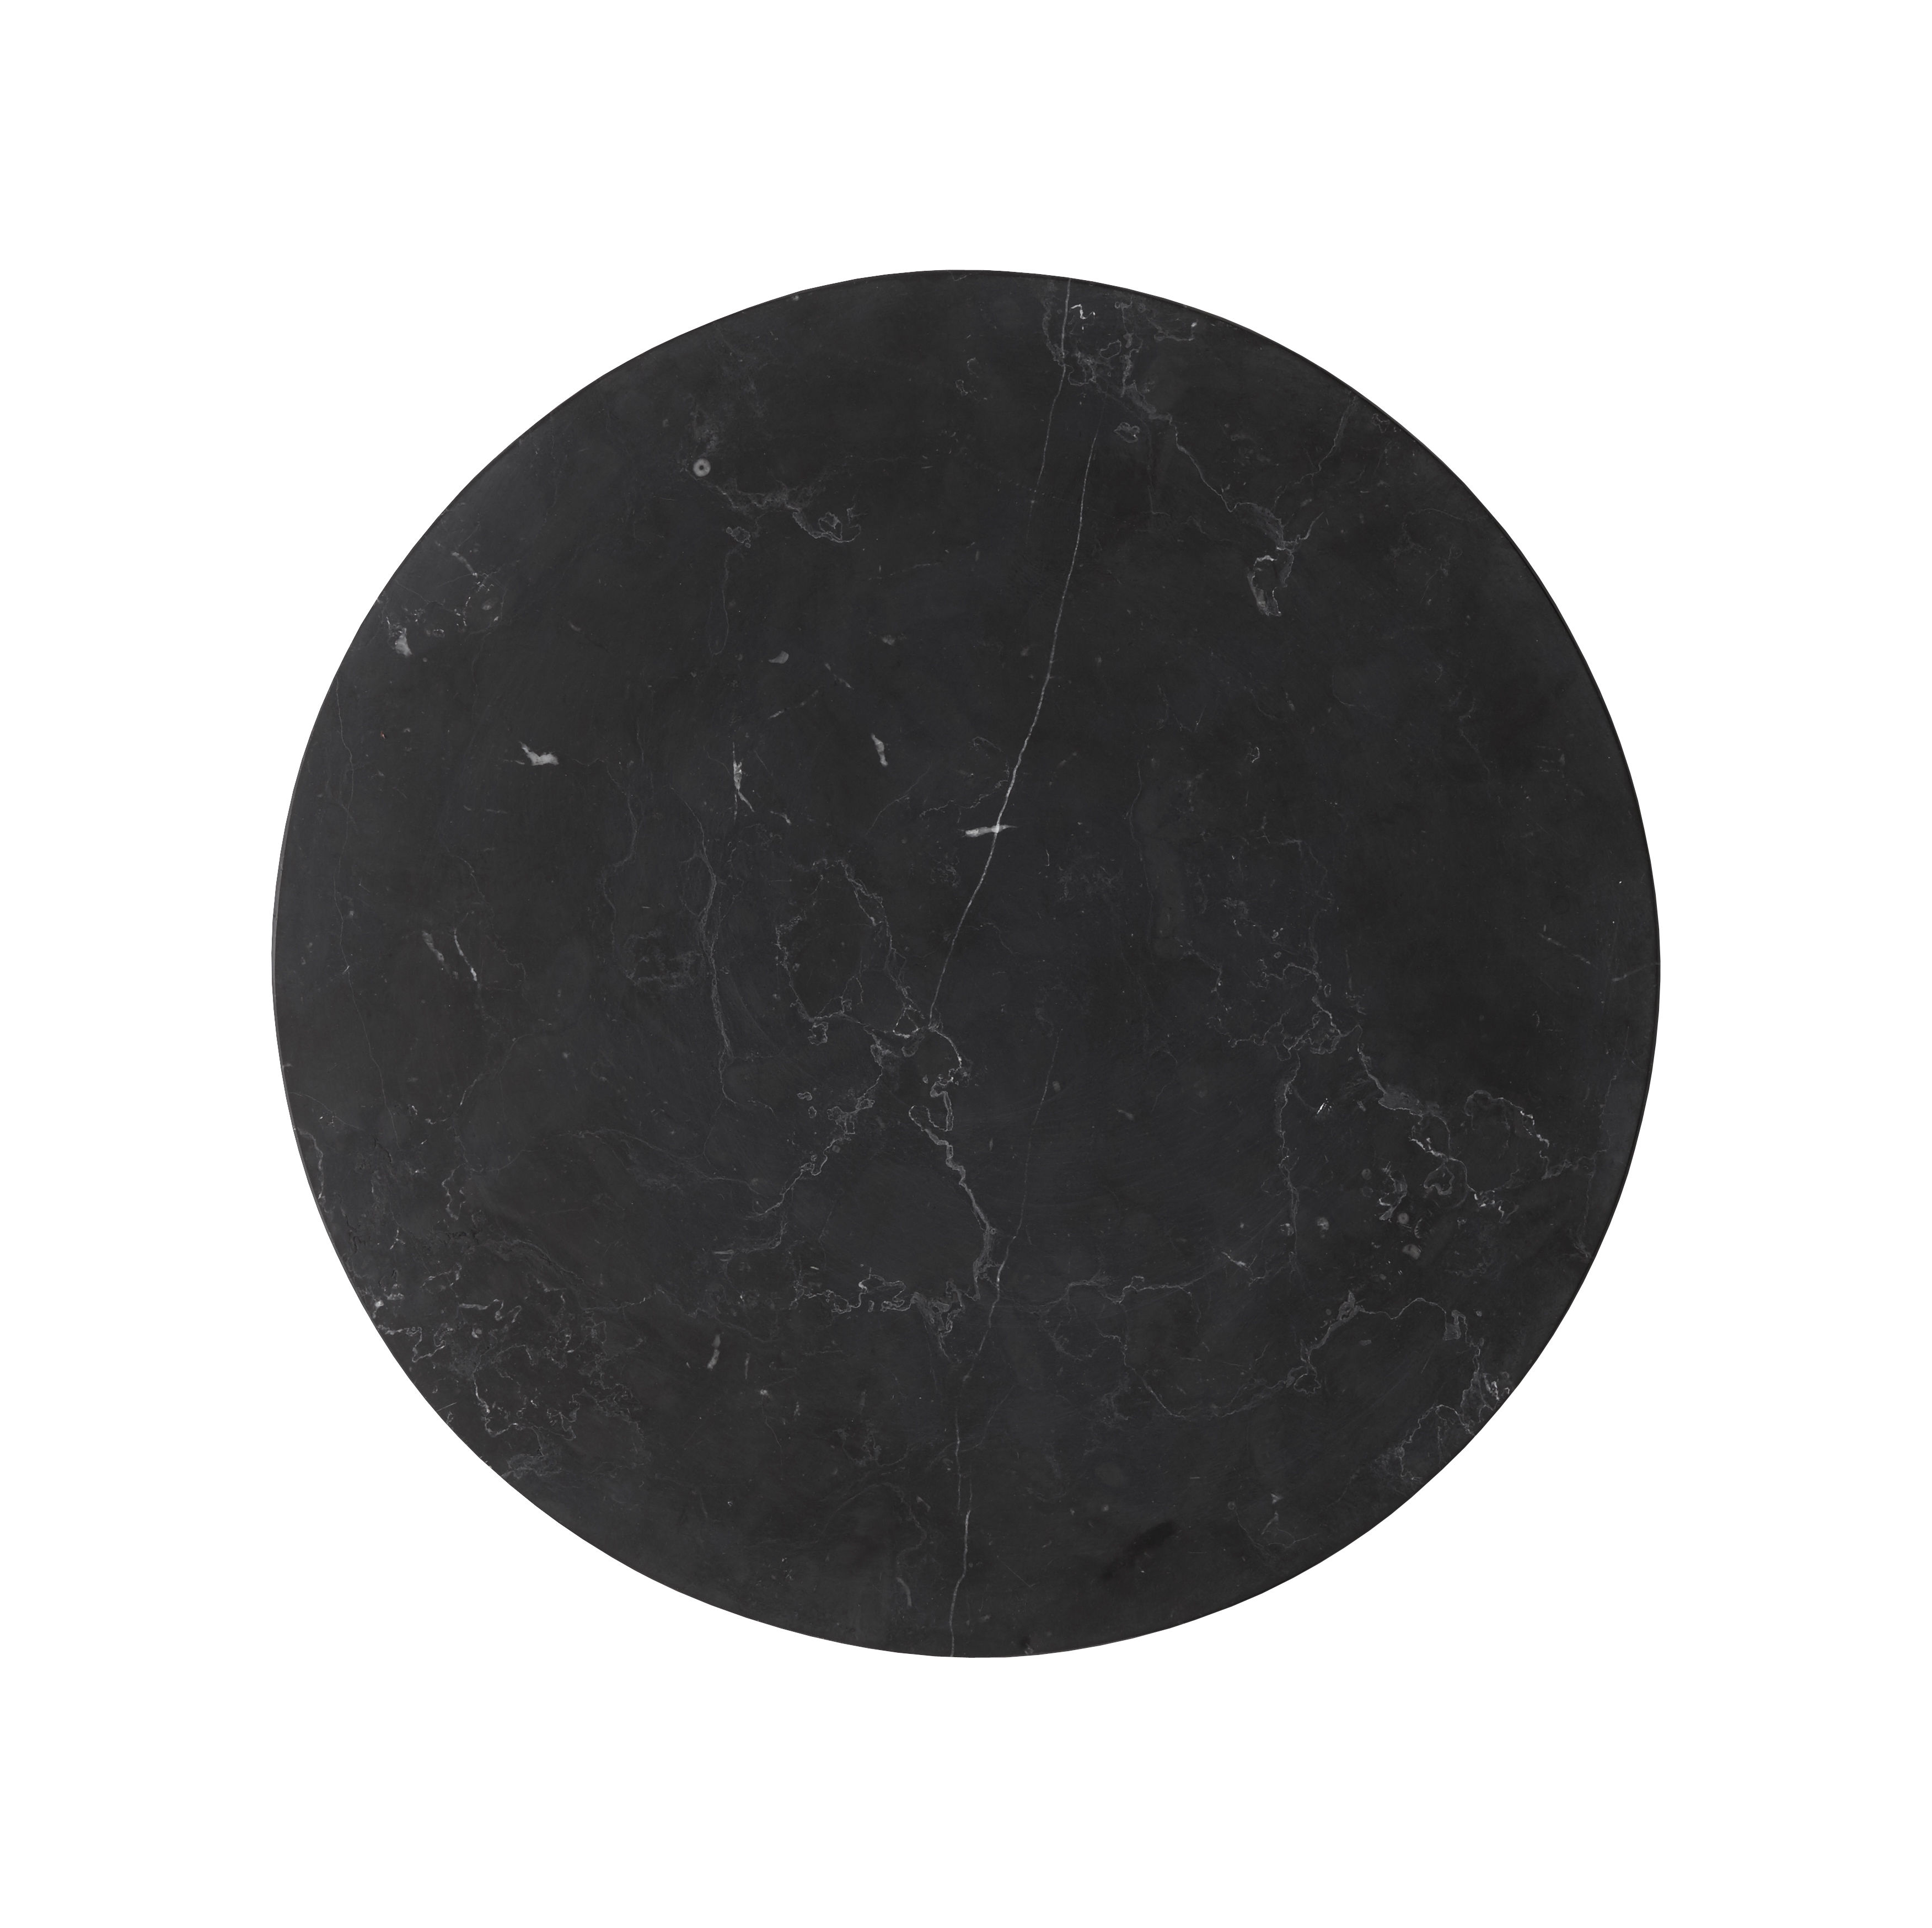 marmor 23 cm f r st nder wire menu tablett. Black Bedroom Furniture Sets. Home Design Ideas